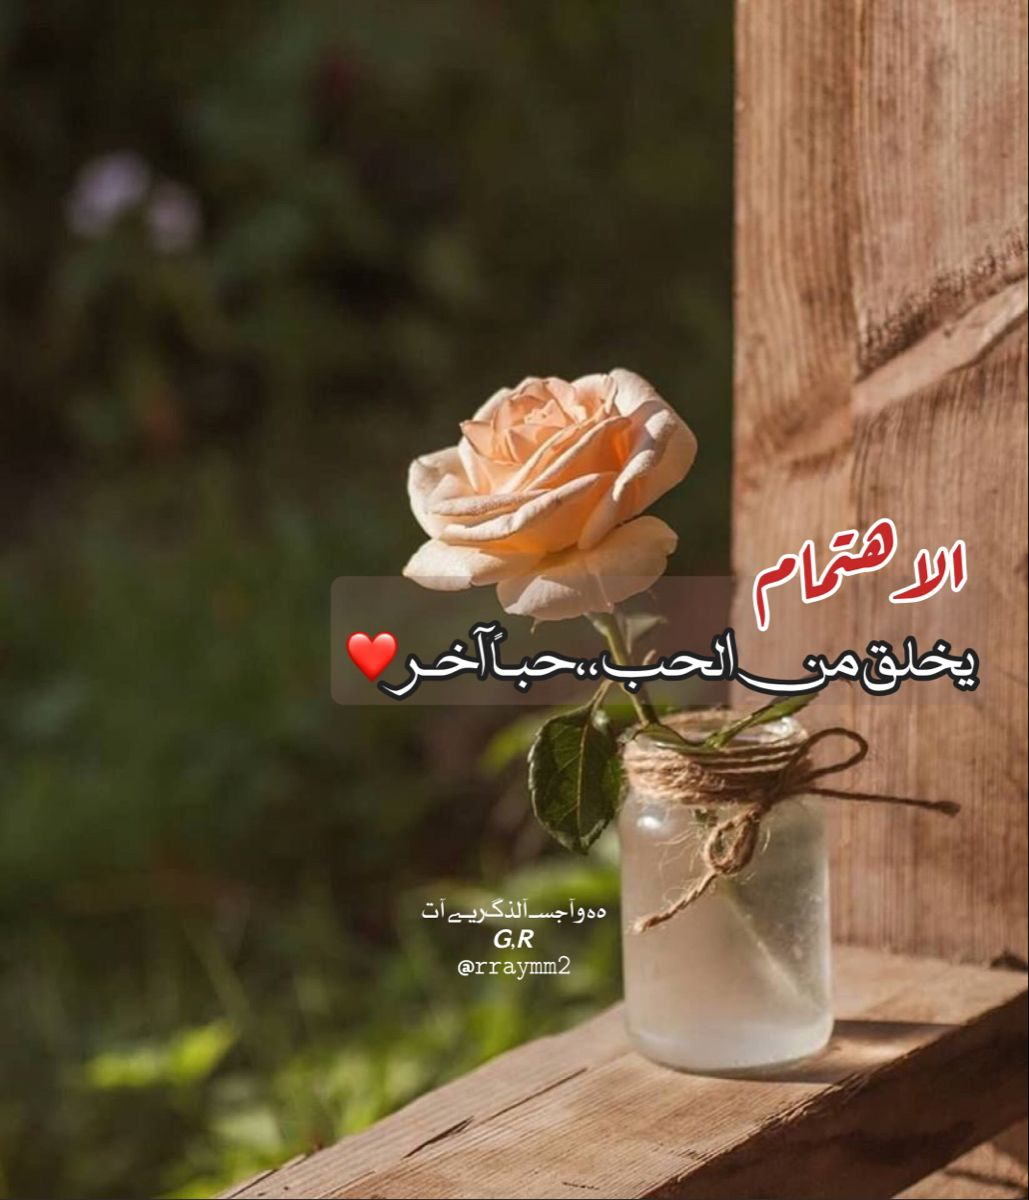 Pin By هہ وآجسـ آلذگريـﮯآت 𝙂 𝙍 On G R Food Arabic Calligraphy Condiments